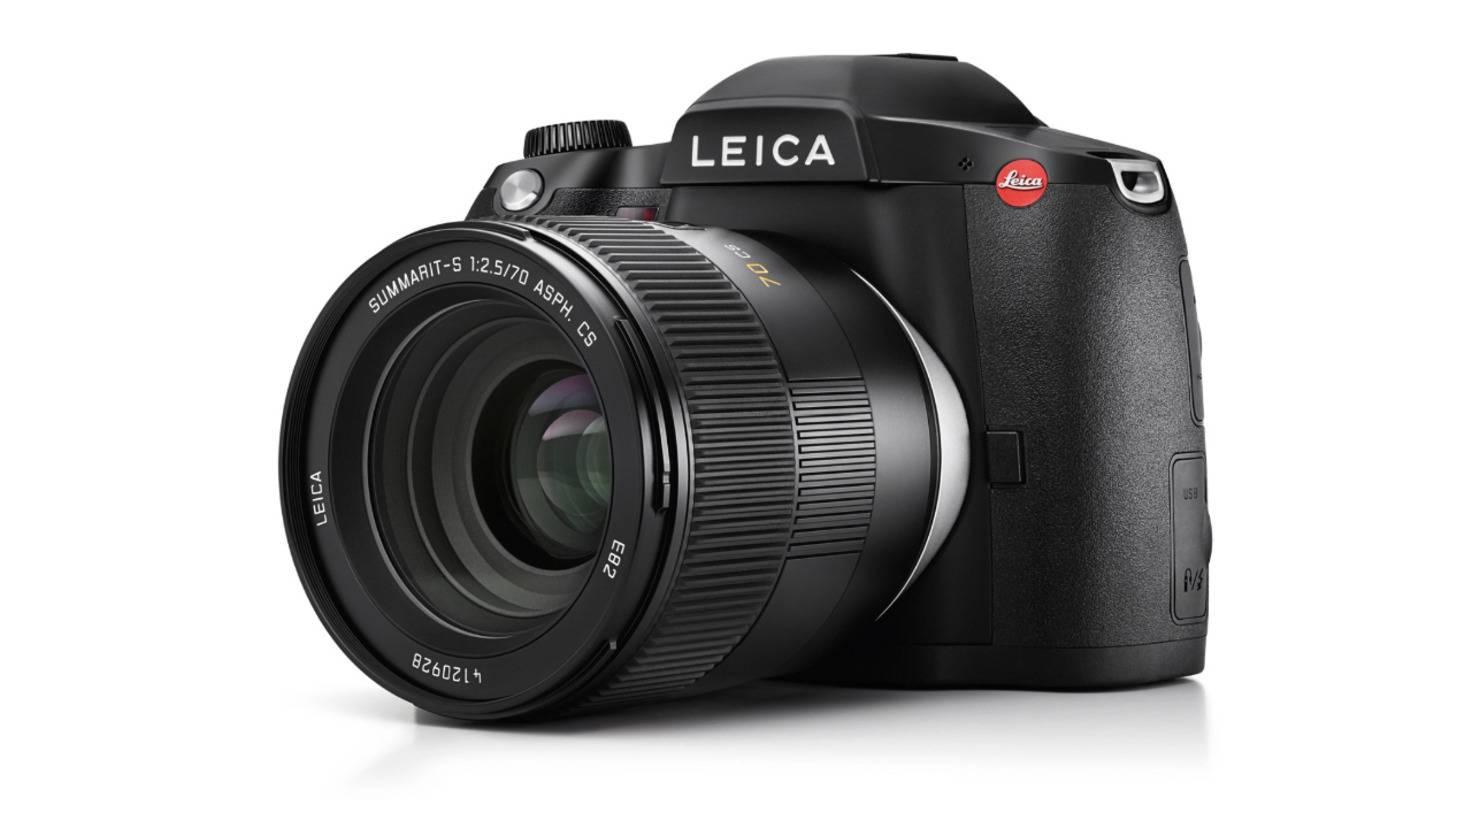 Leica s3 vorne